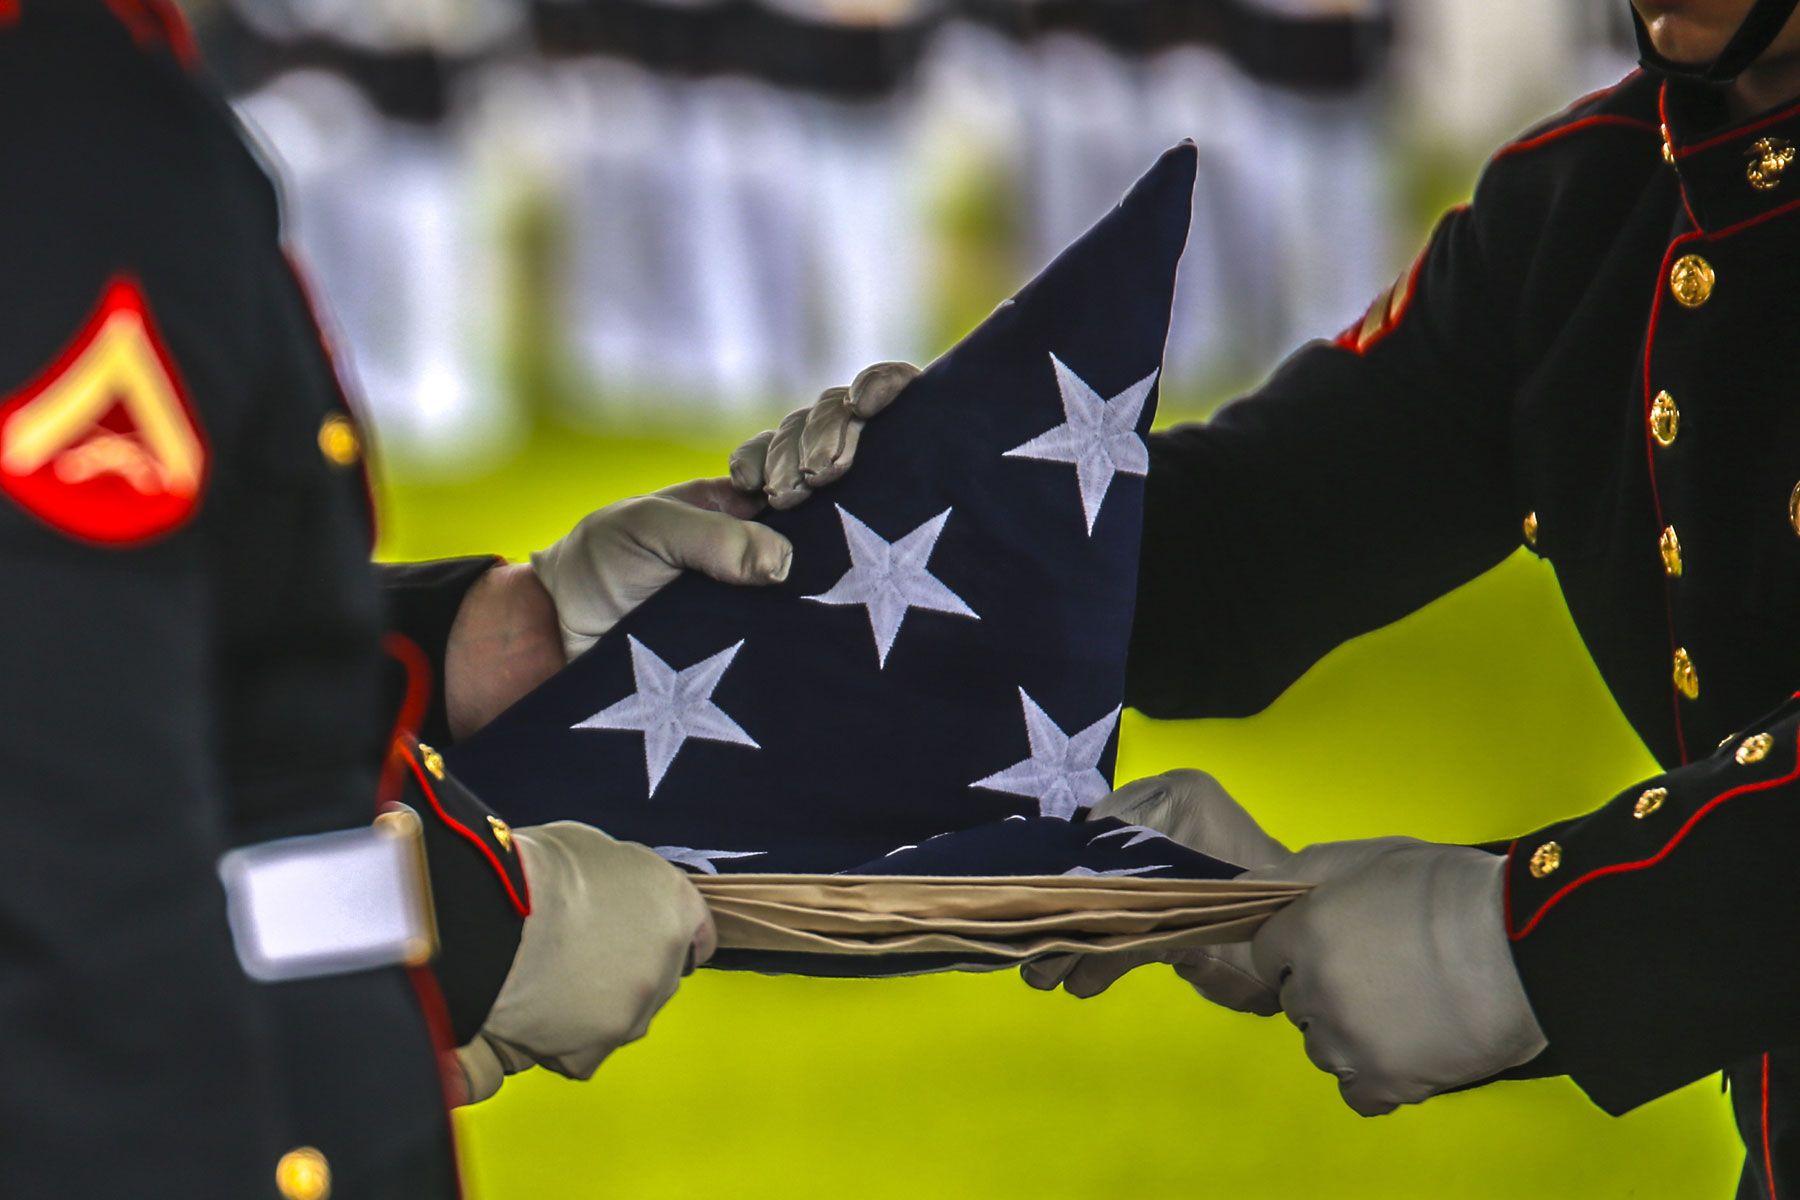 When Debra Tainsh's veteran husband died of illness traced